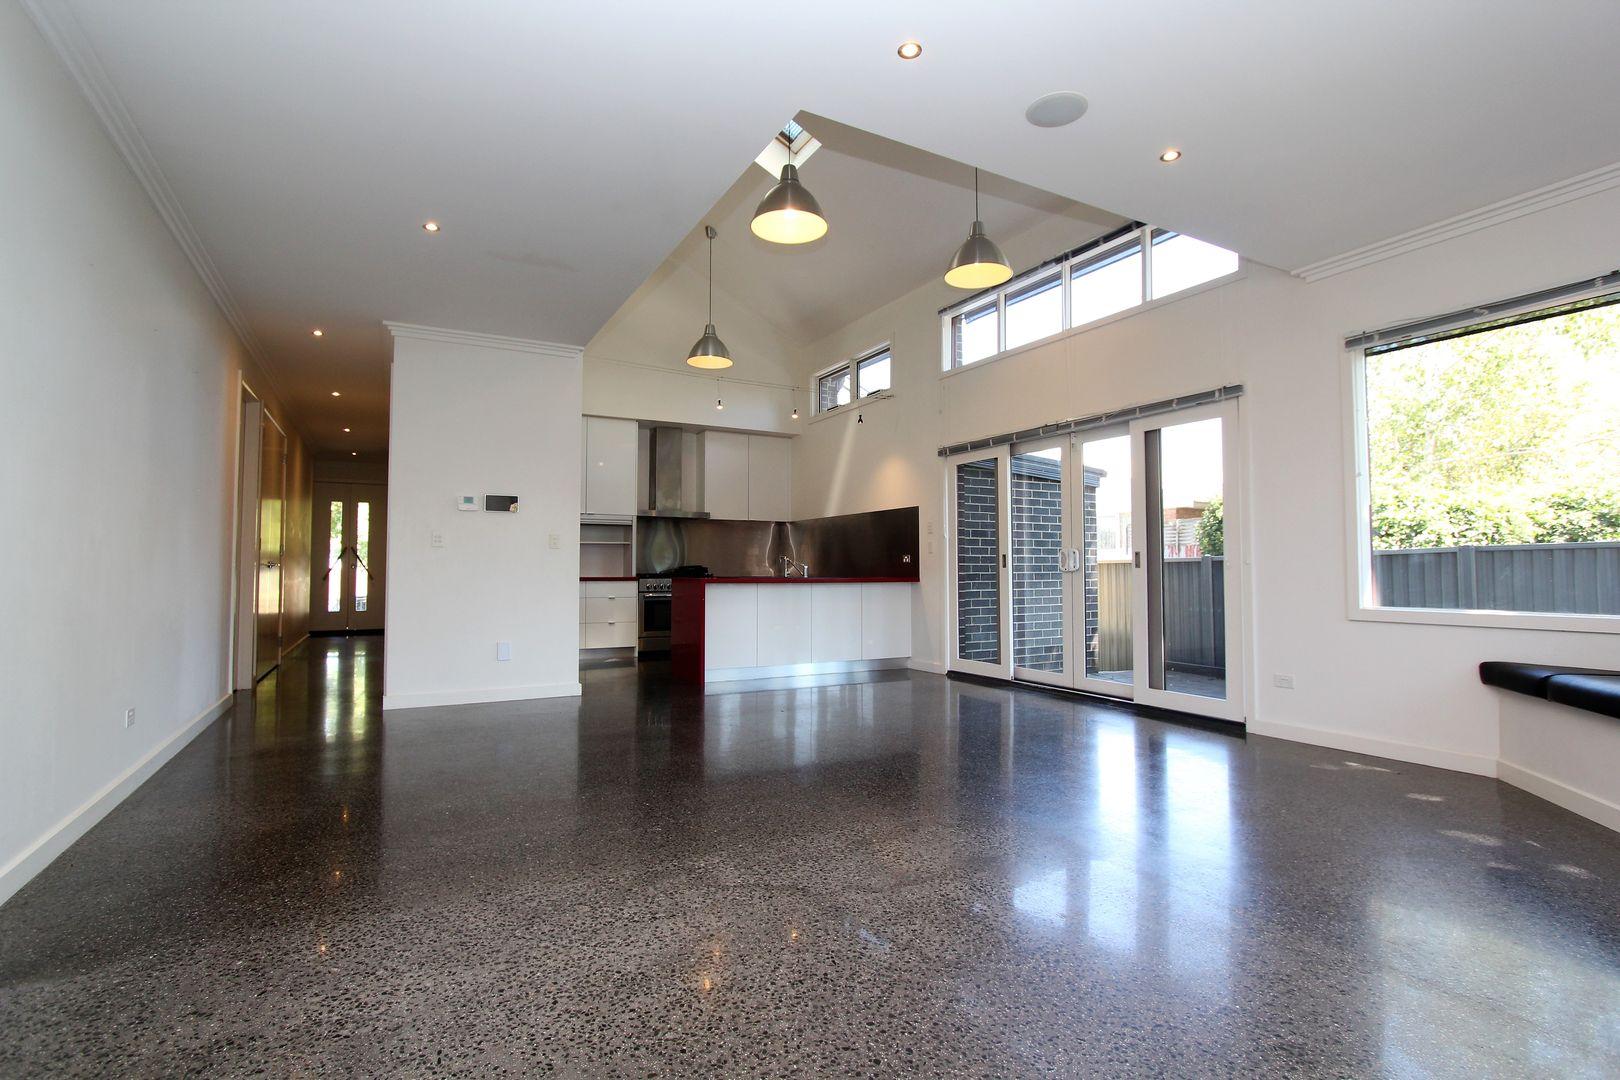 201 Ripon Street South, Ballarat Central VIC 3350, Image 2